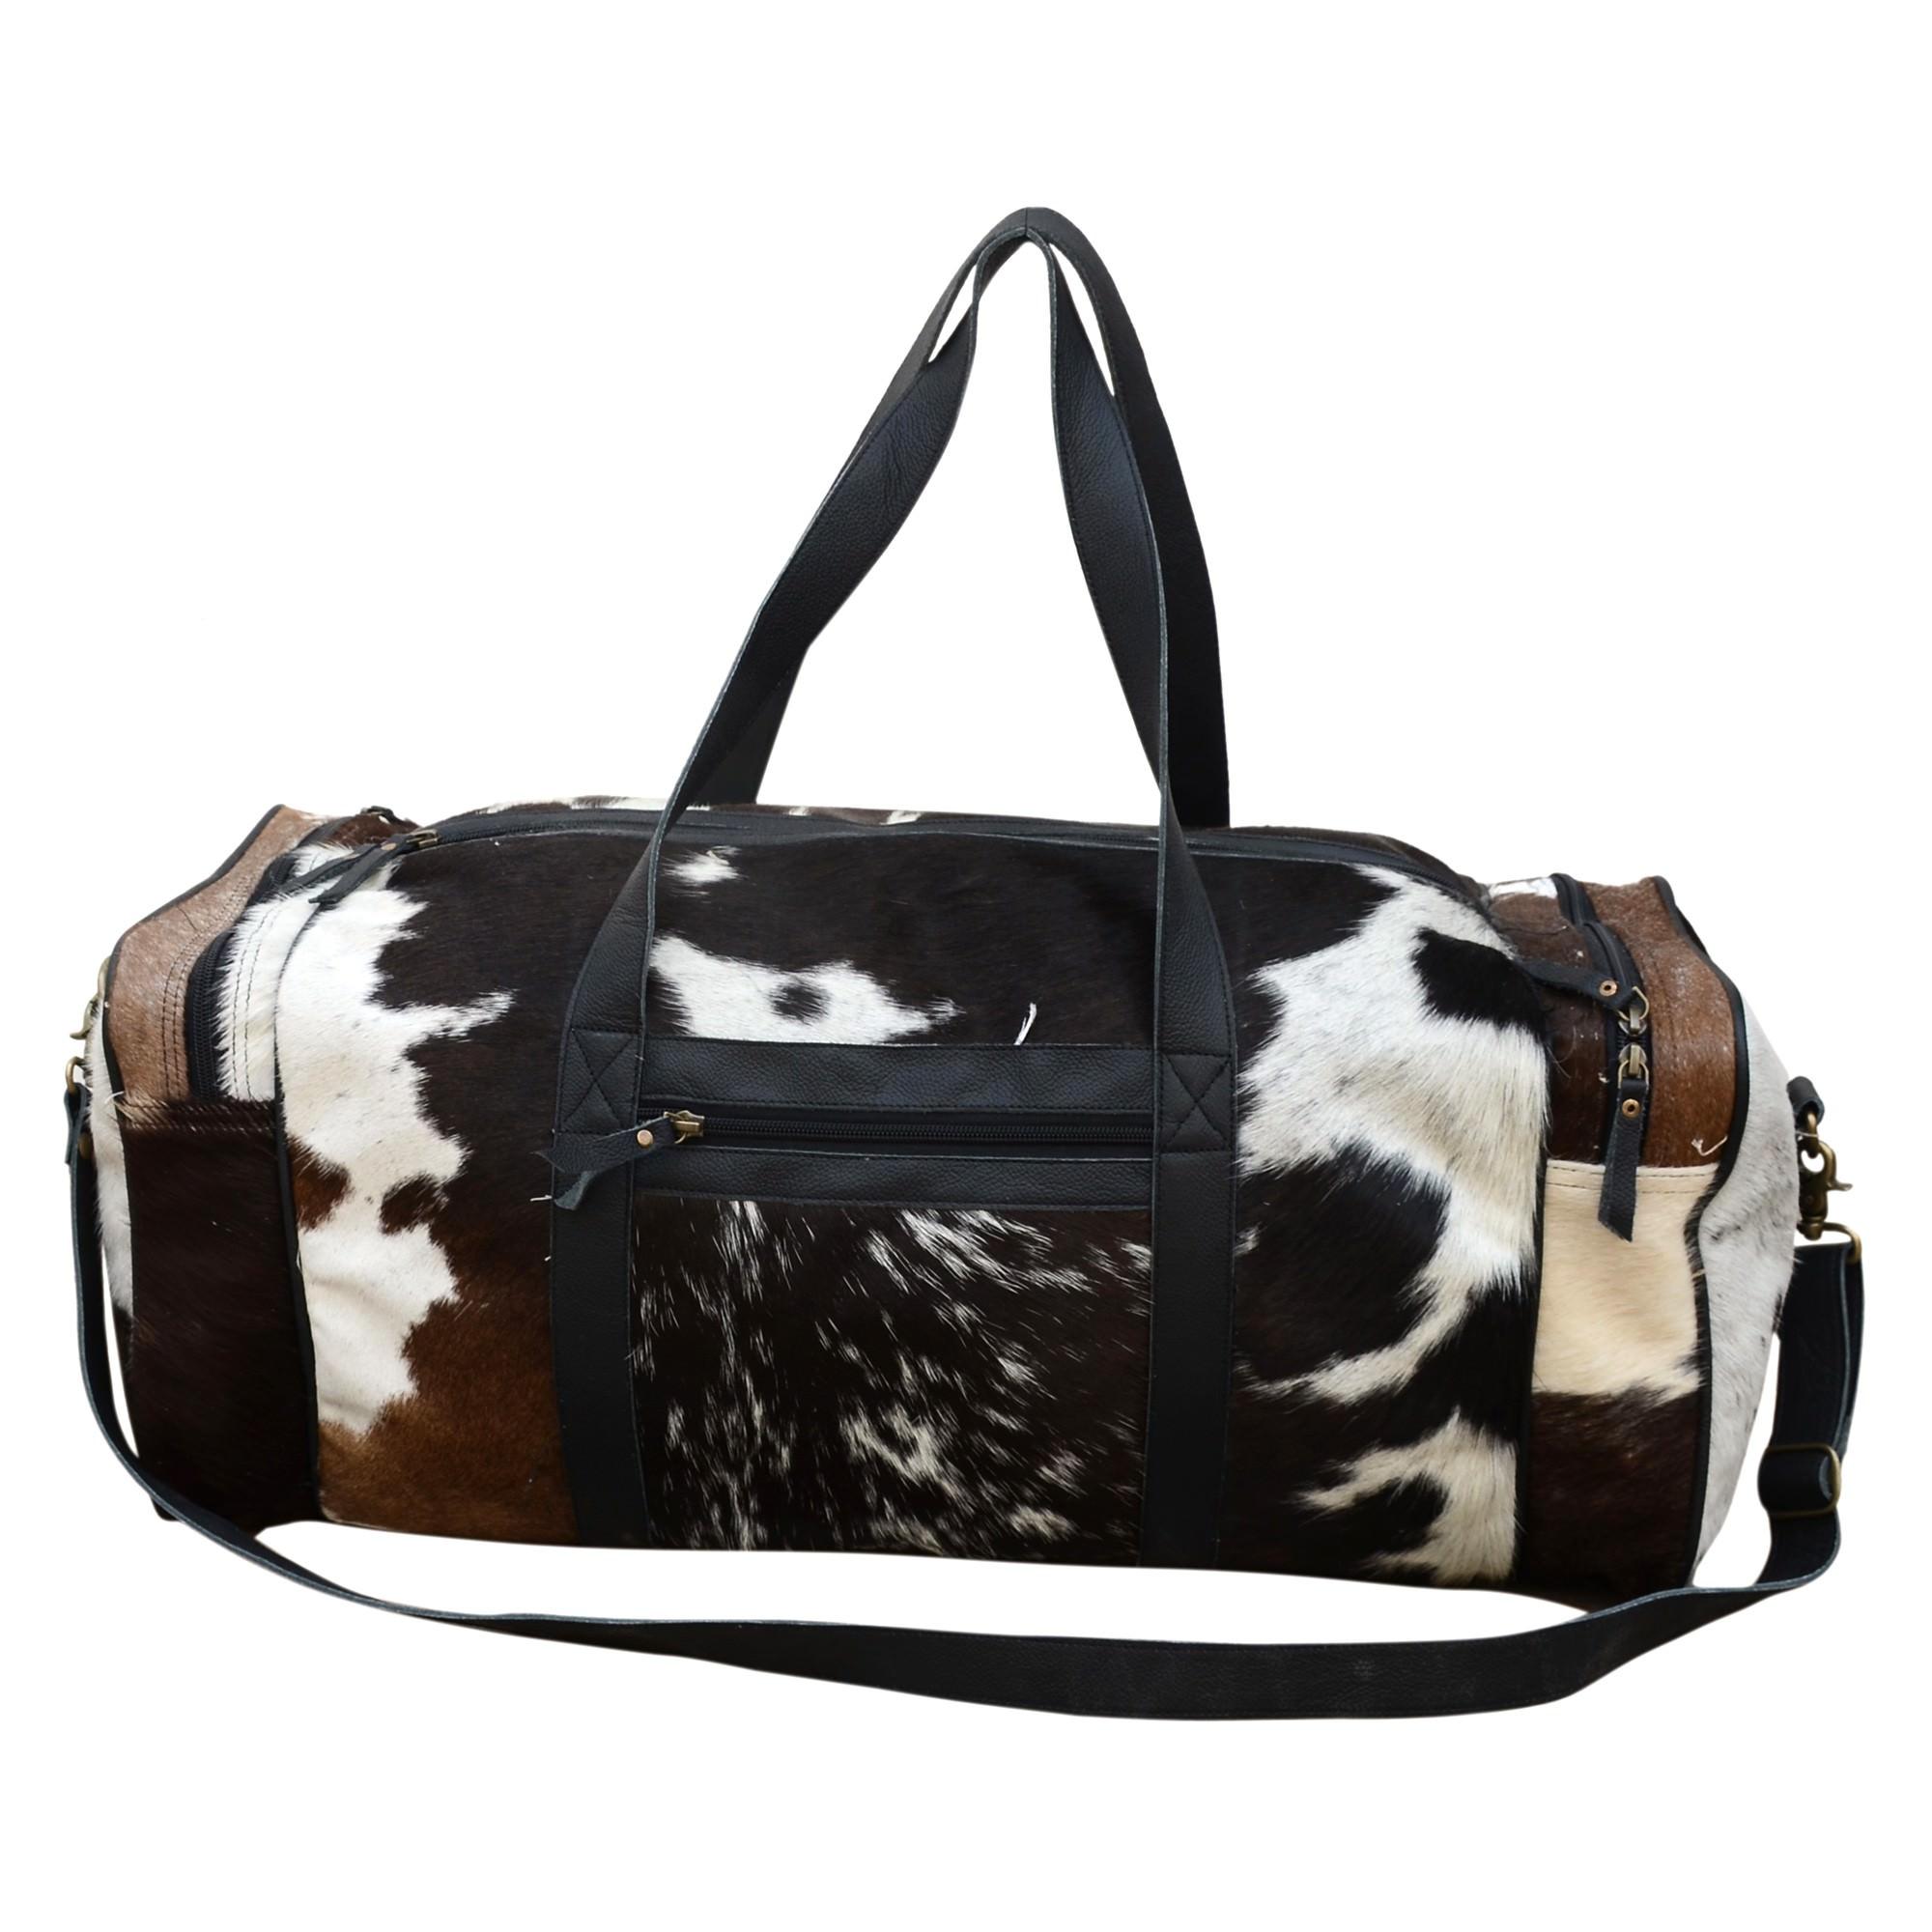 Ariela Leather & Cowhide Duffle Bag